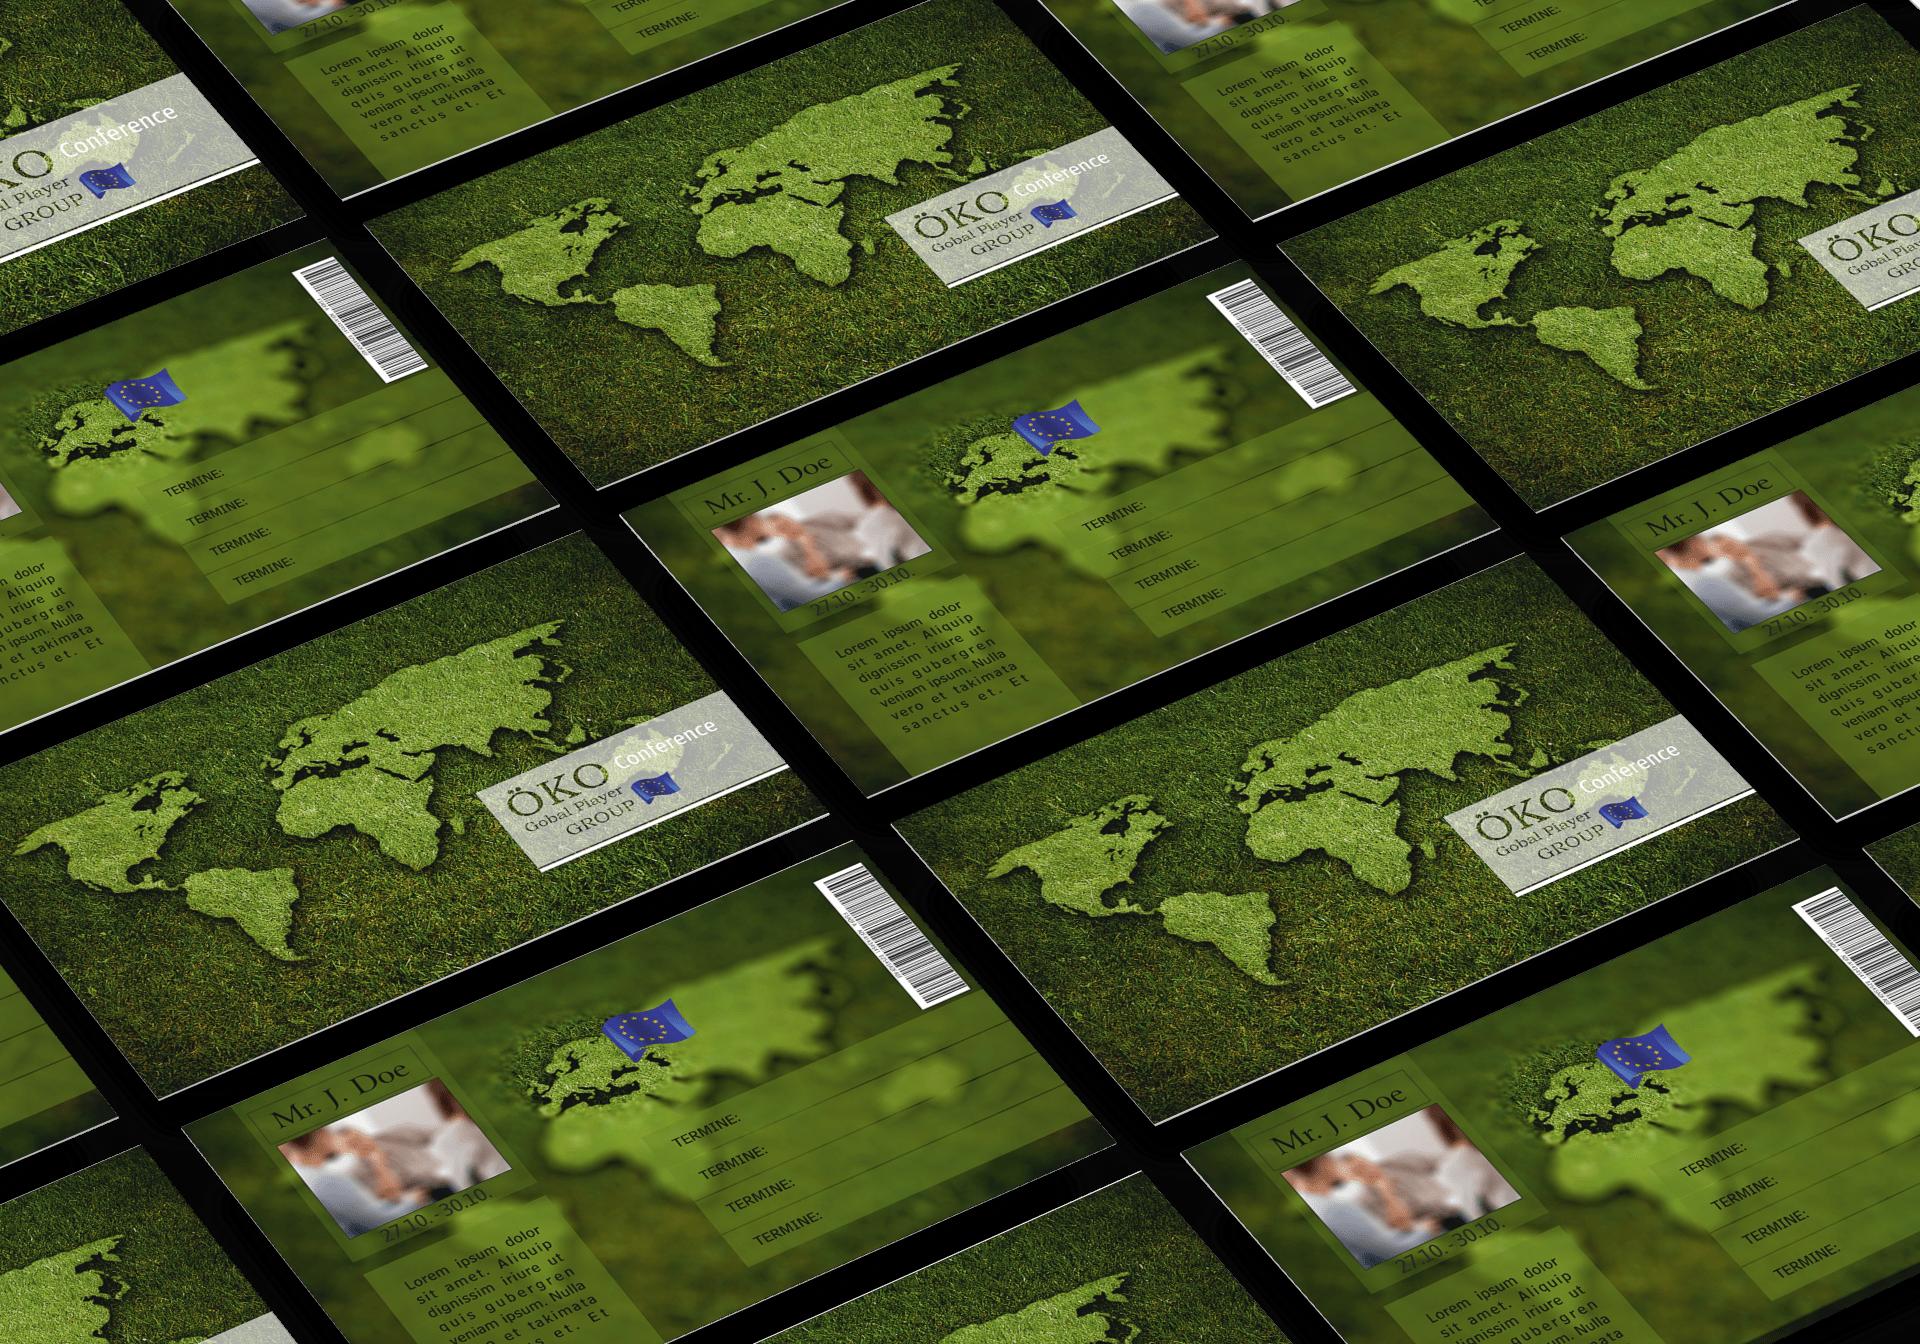 "GRASKARTE ""ÖKO GLOBAL PLAYER"" Design Vorlage GK-2019-000140"